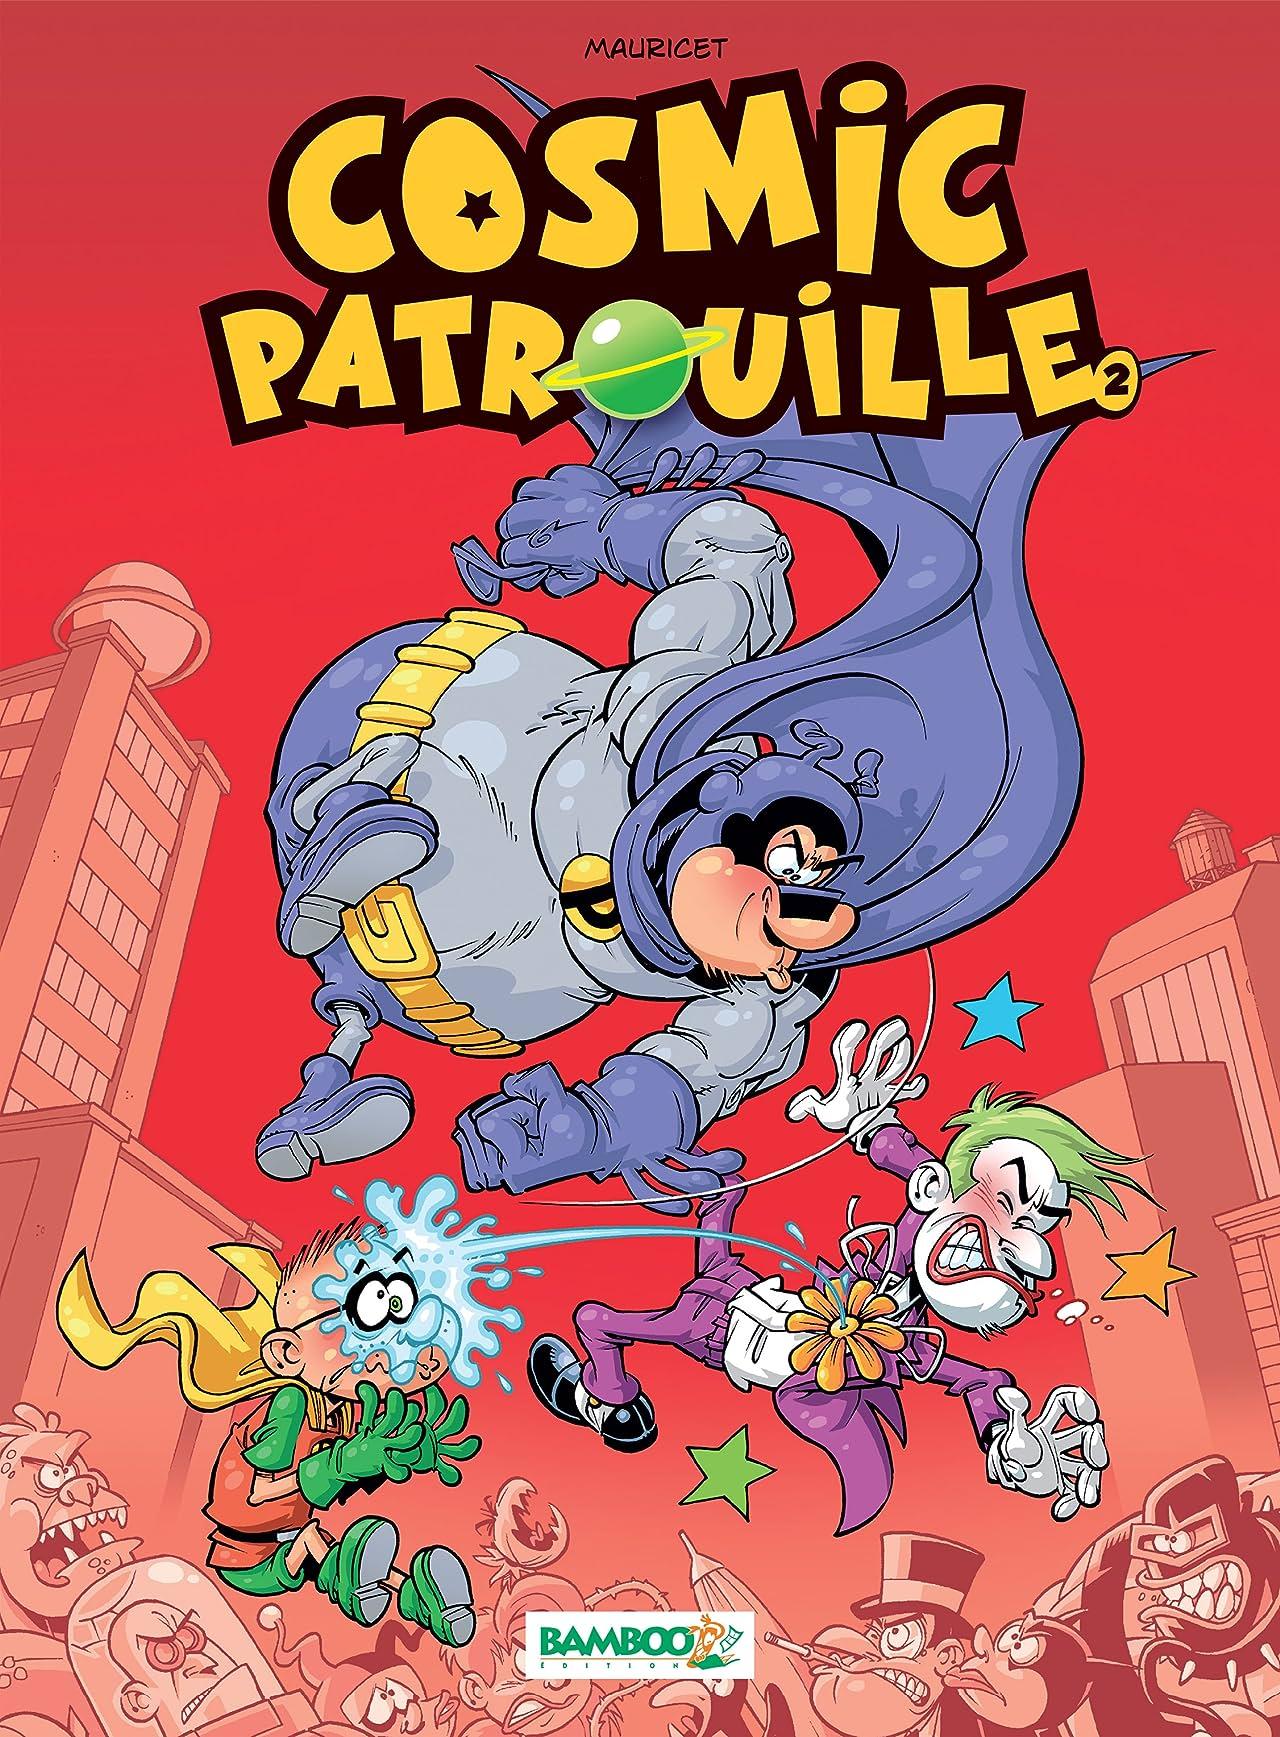 Cosmic Patrouille Vol. 2